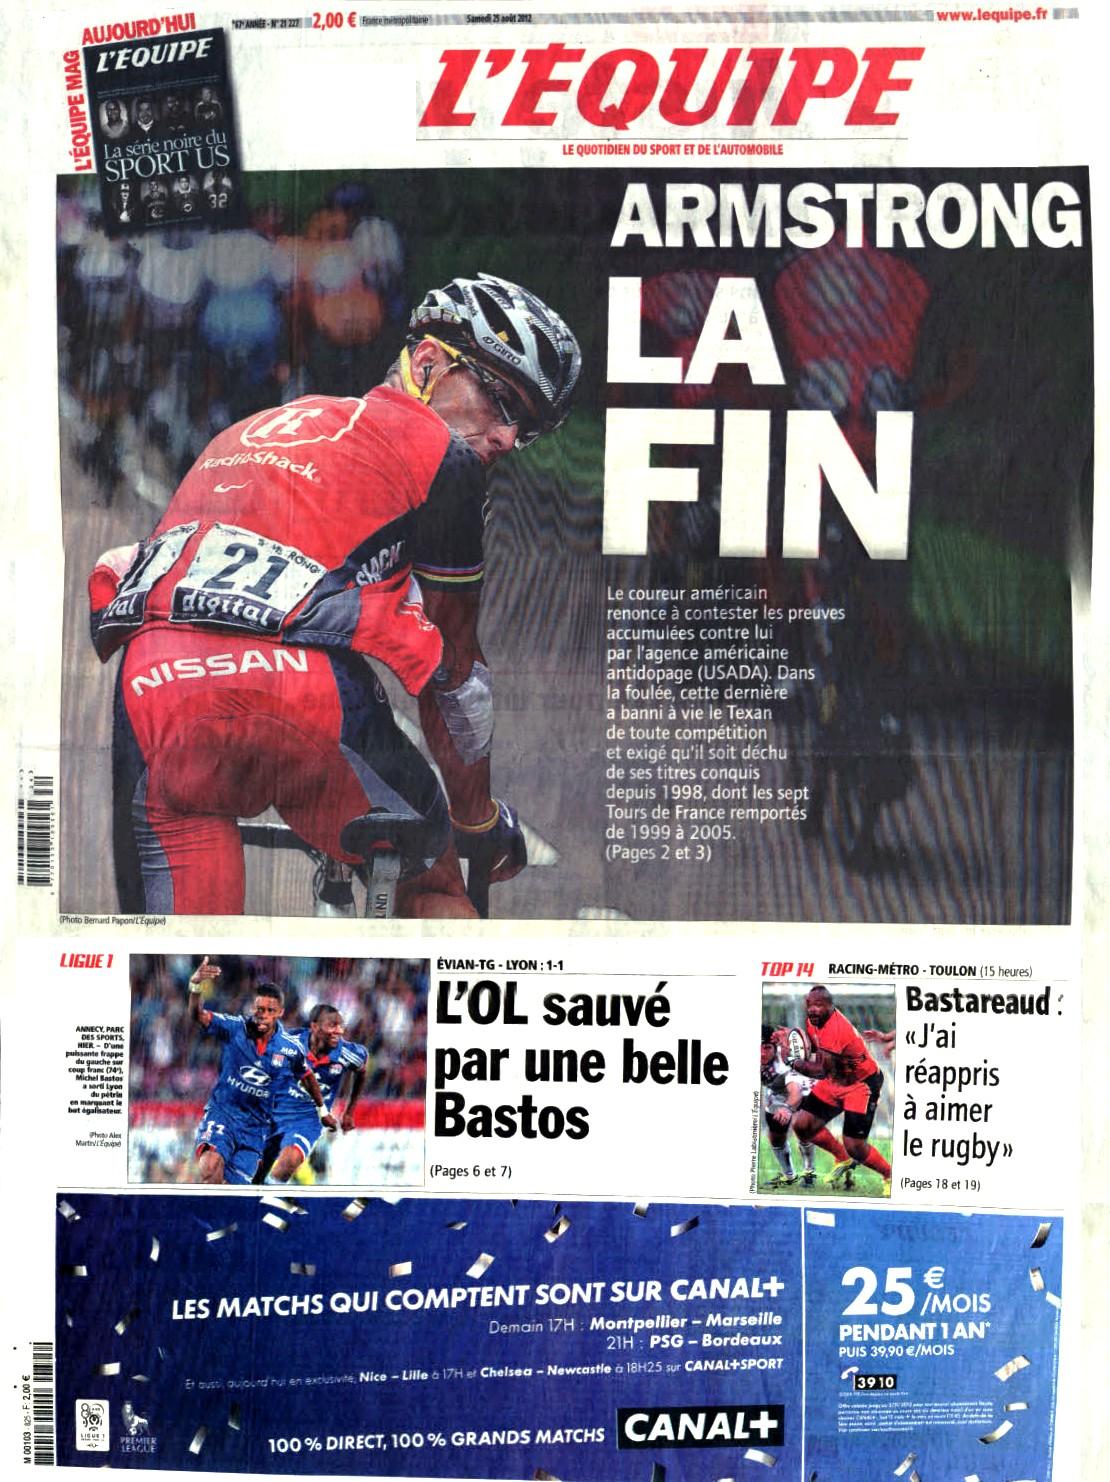 amaury_armstrong_aso_cyclisme_dopage_désinformation_staline_lenine_trotsky_equipe_fake_lance_tour_de_france_uci_contrefaçon_usada